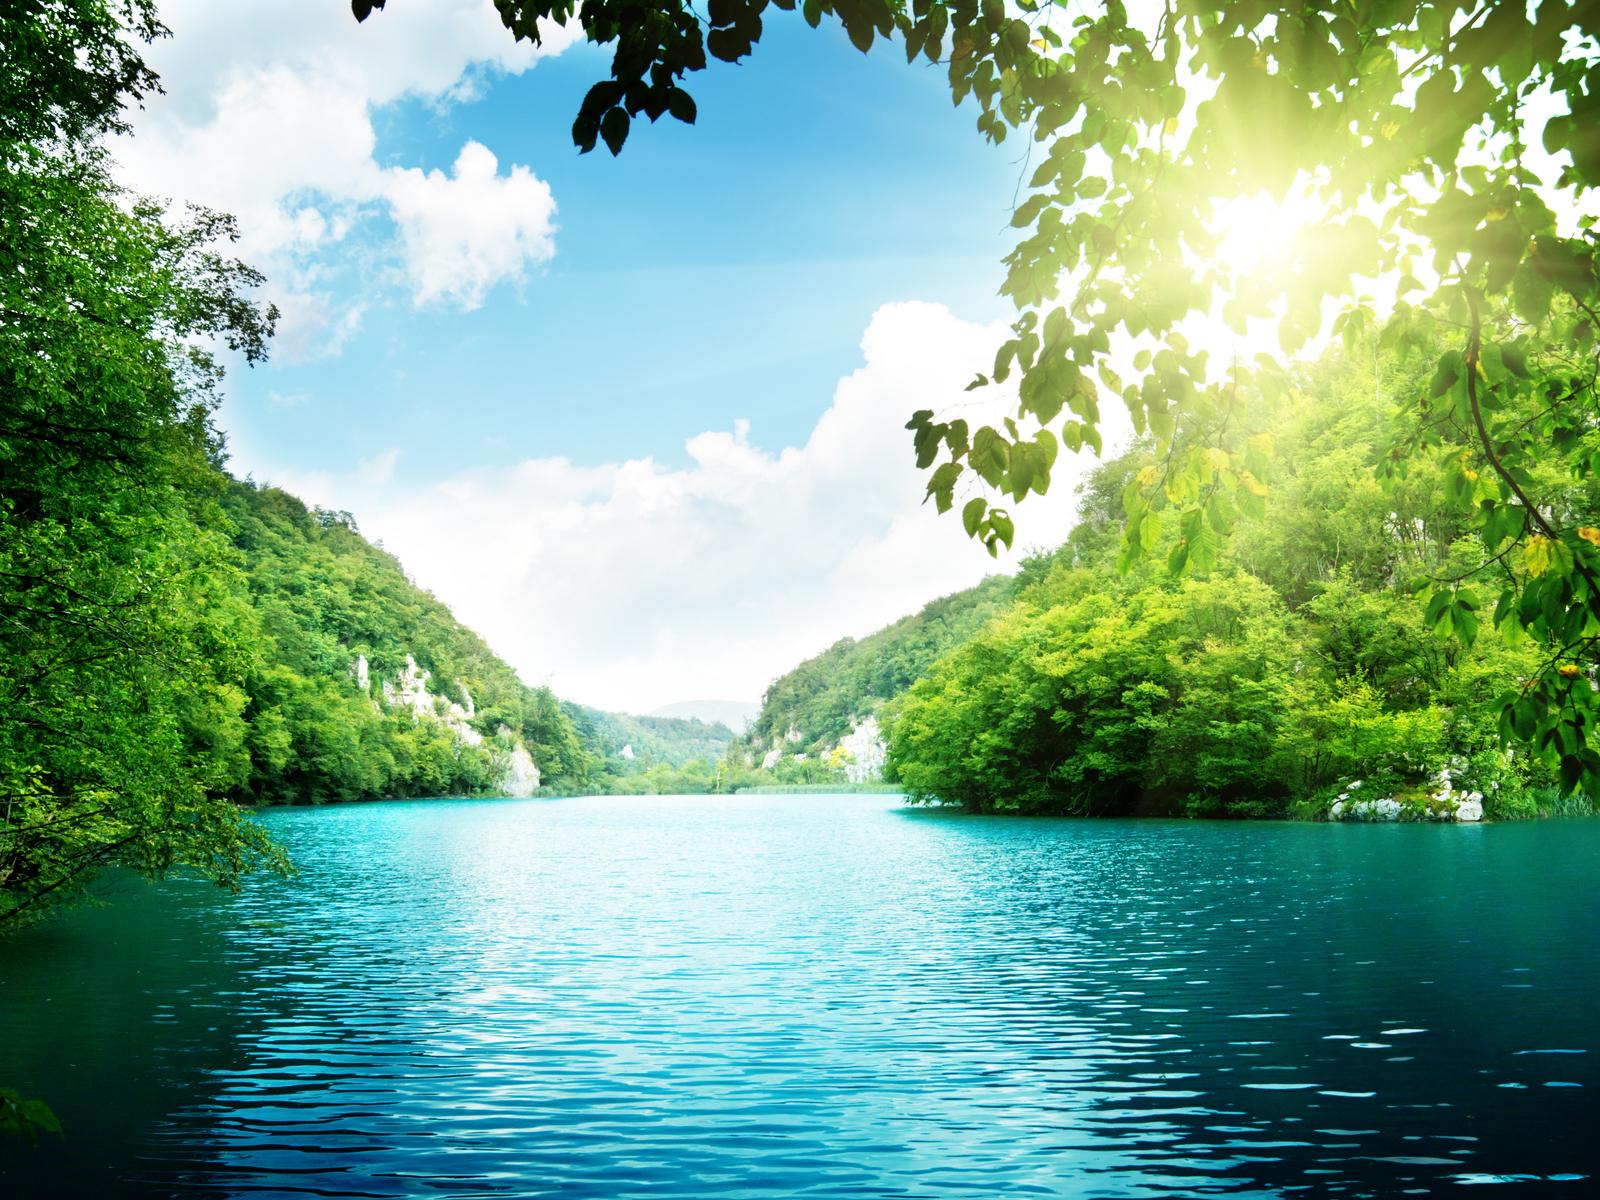 Sunshine Between Leaves Green Mountains HD Wallpaper